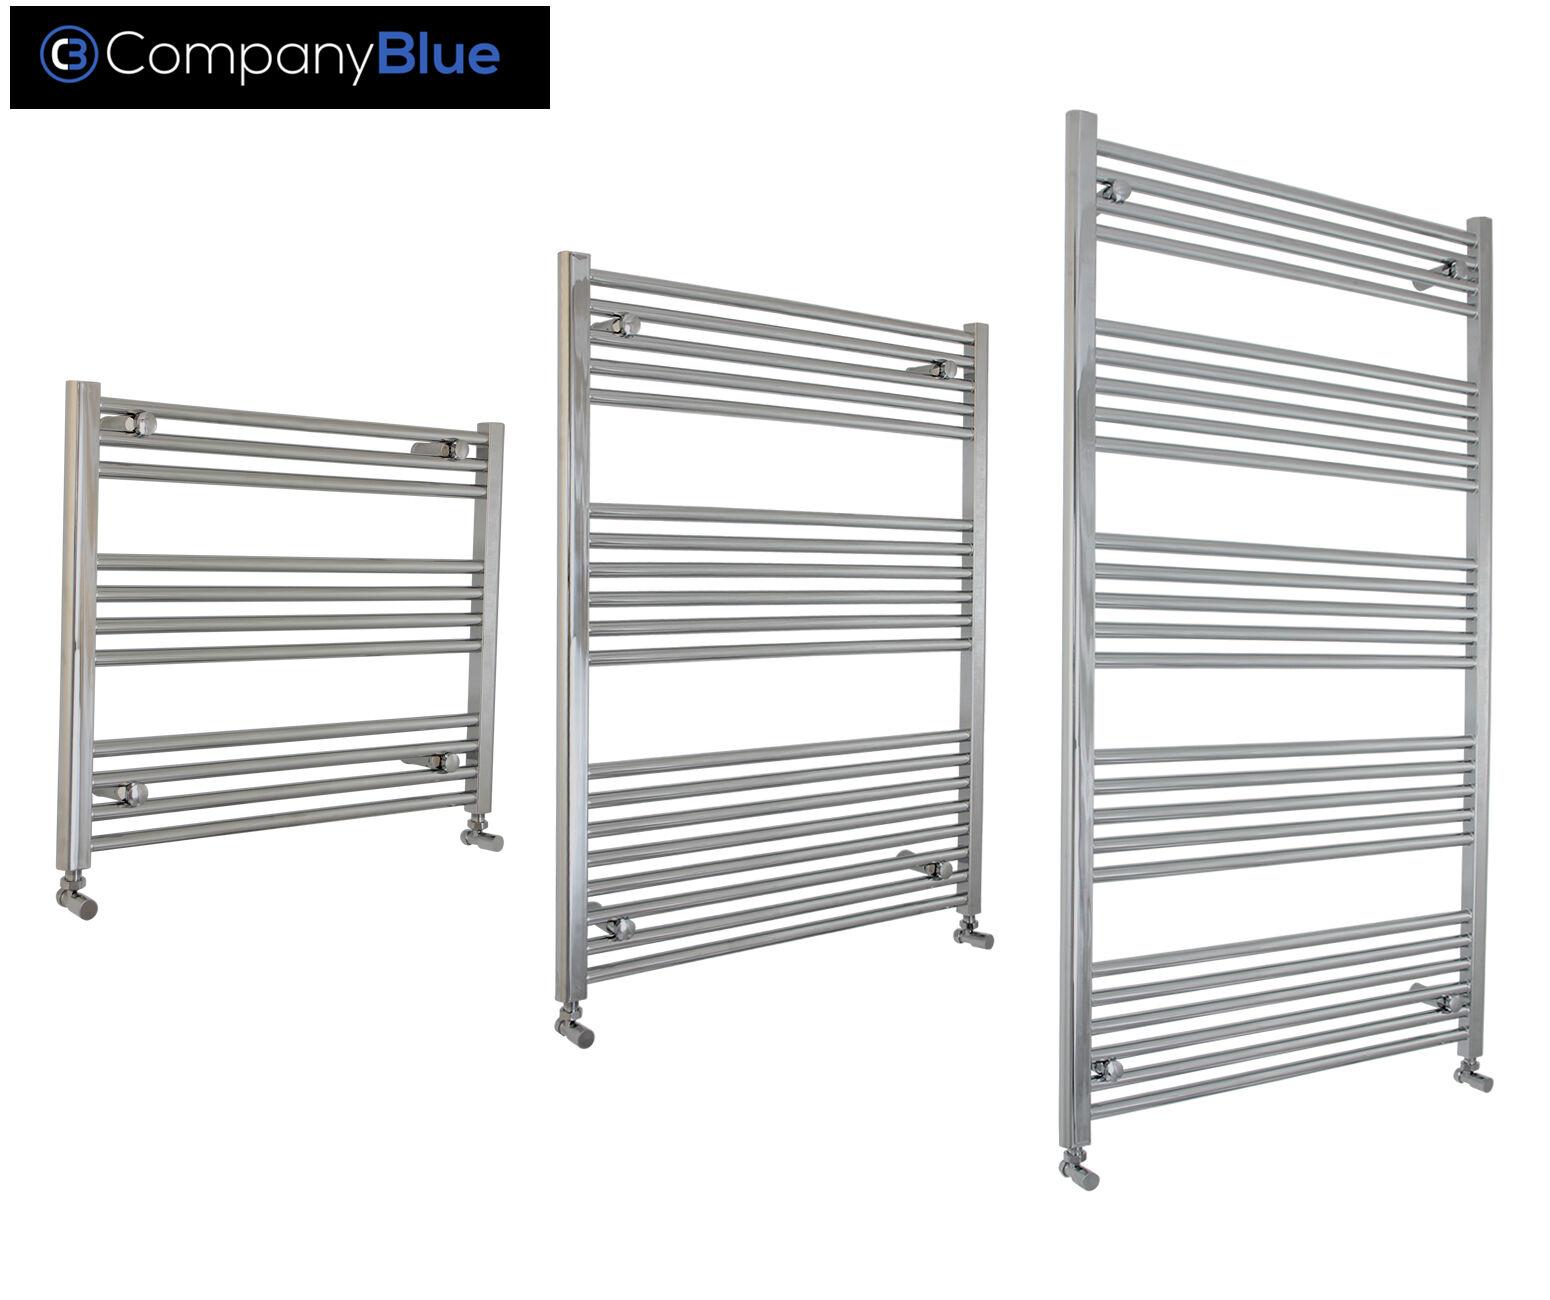 Chrome Towel Rail Rad Central Heating Bathroom Radiator 900mm Wide x 900 mm (w)